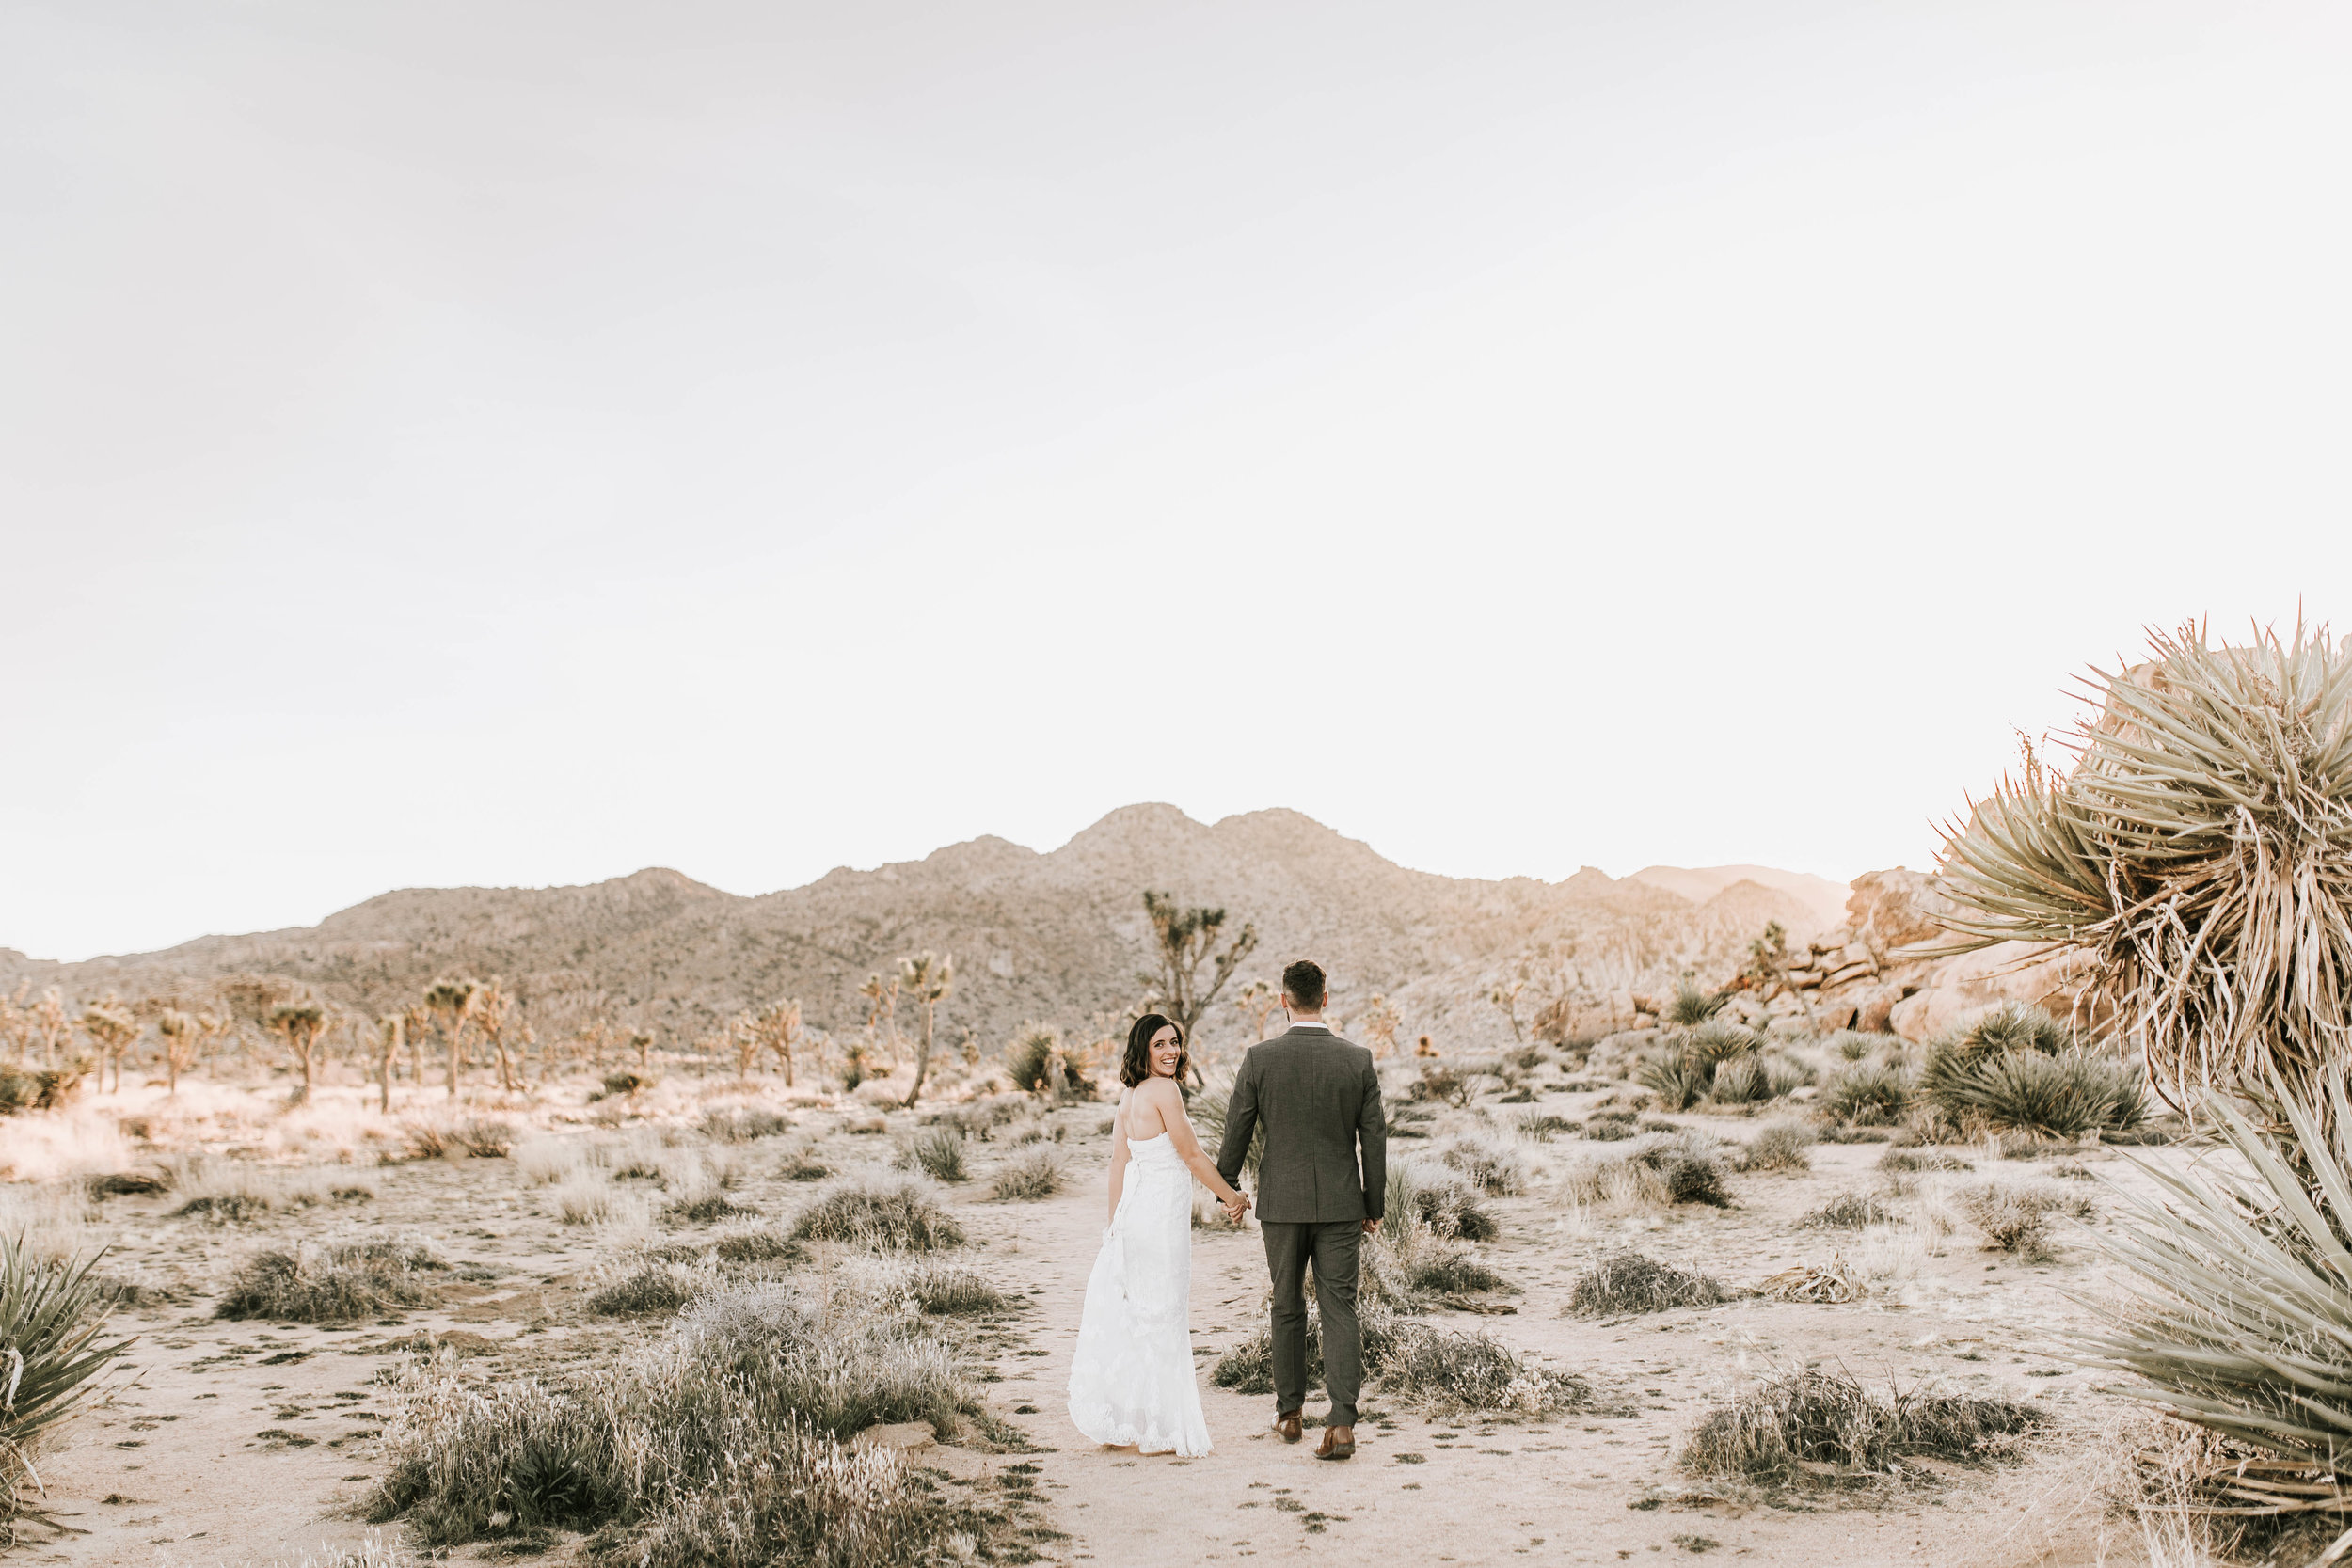 nicole-daacke-photography-joshua-tree-adventurous-elopement-wedding-national-park-wedding-photographer-adventure-wedding-adventurous-elopement-jtree-joshua-tree-national-park-wedding-photographer-intimate-weddings-golden-desert-love-20.jpg